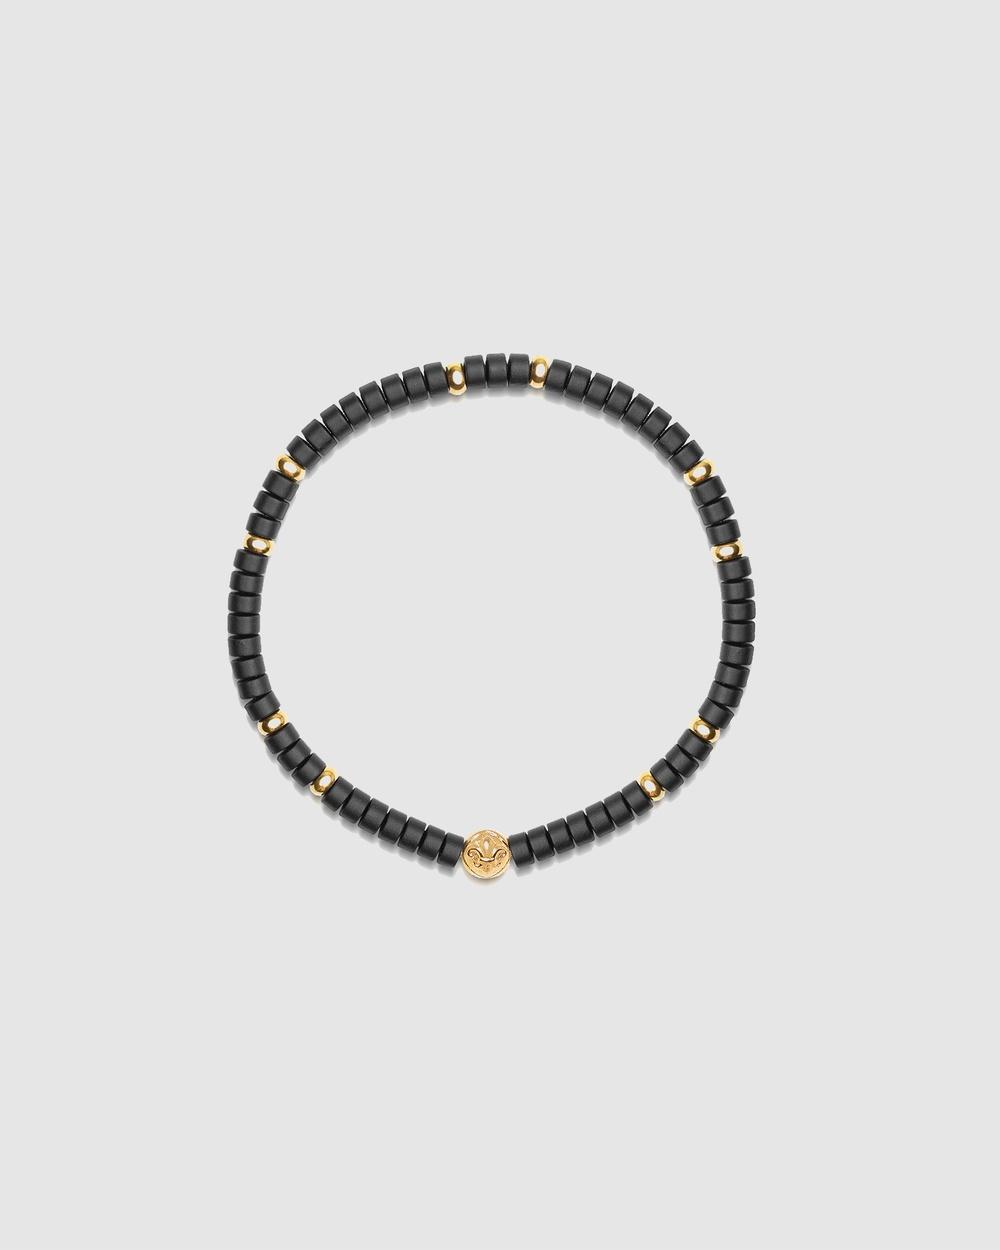 Nialaya Jewellery Wristband with Onyx and Gold Black